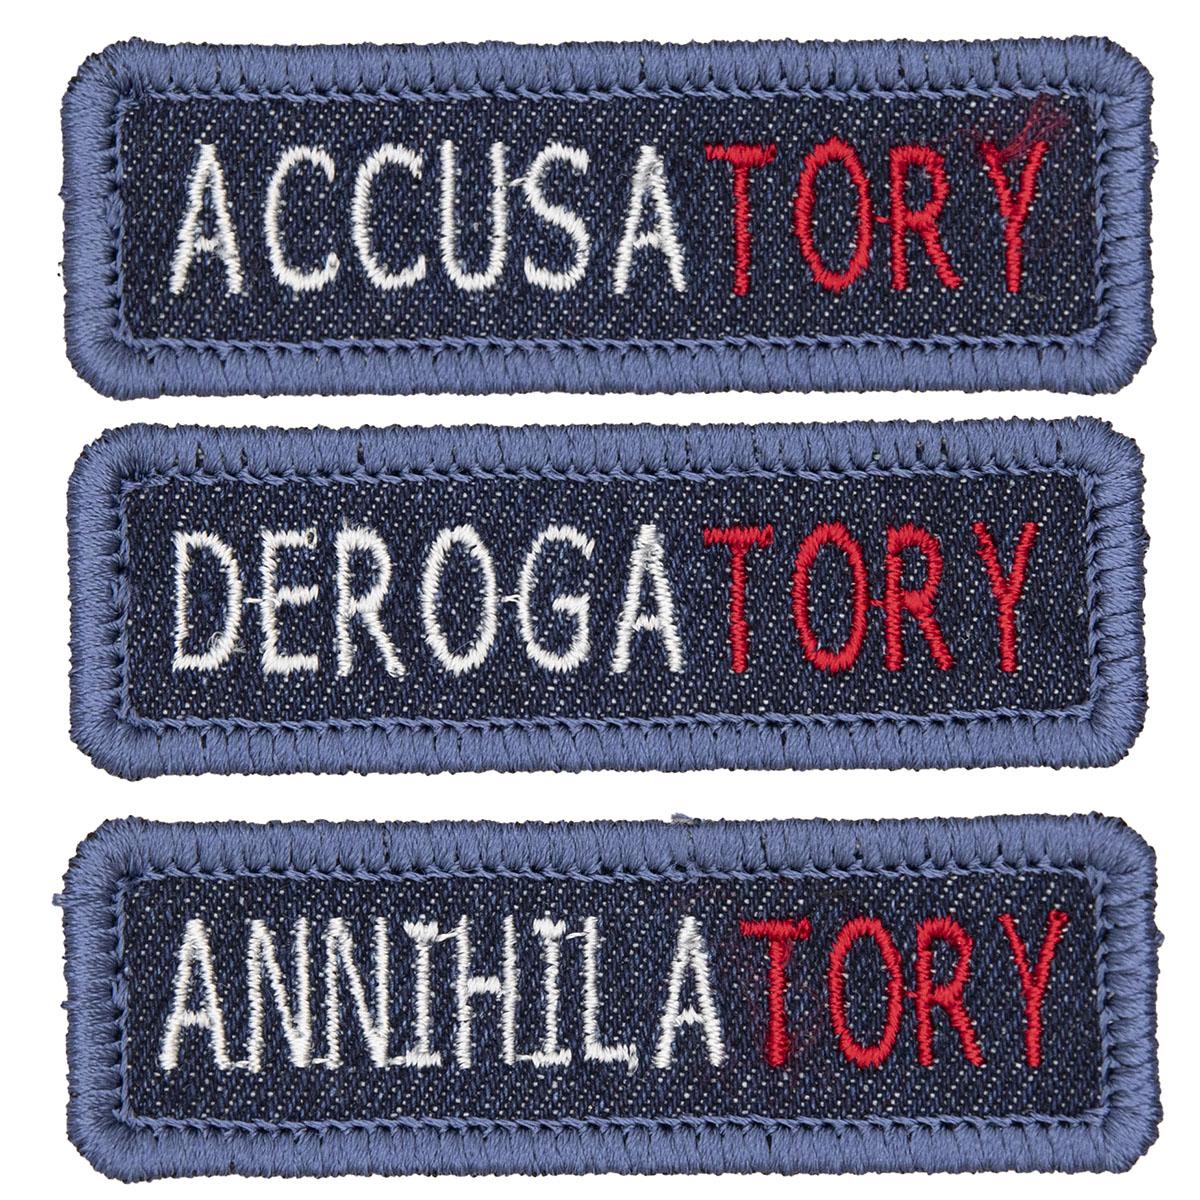 three embroidered patches Accusatory Derogatory Annihilatory